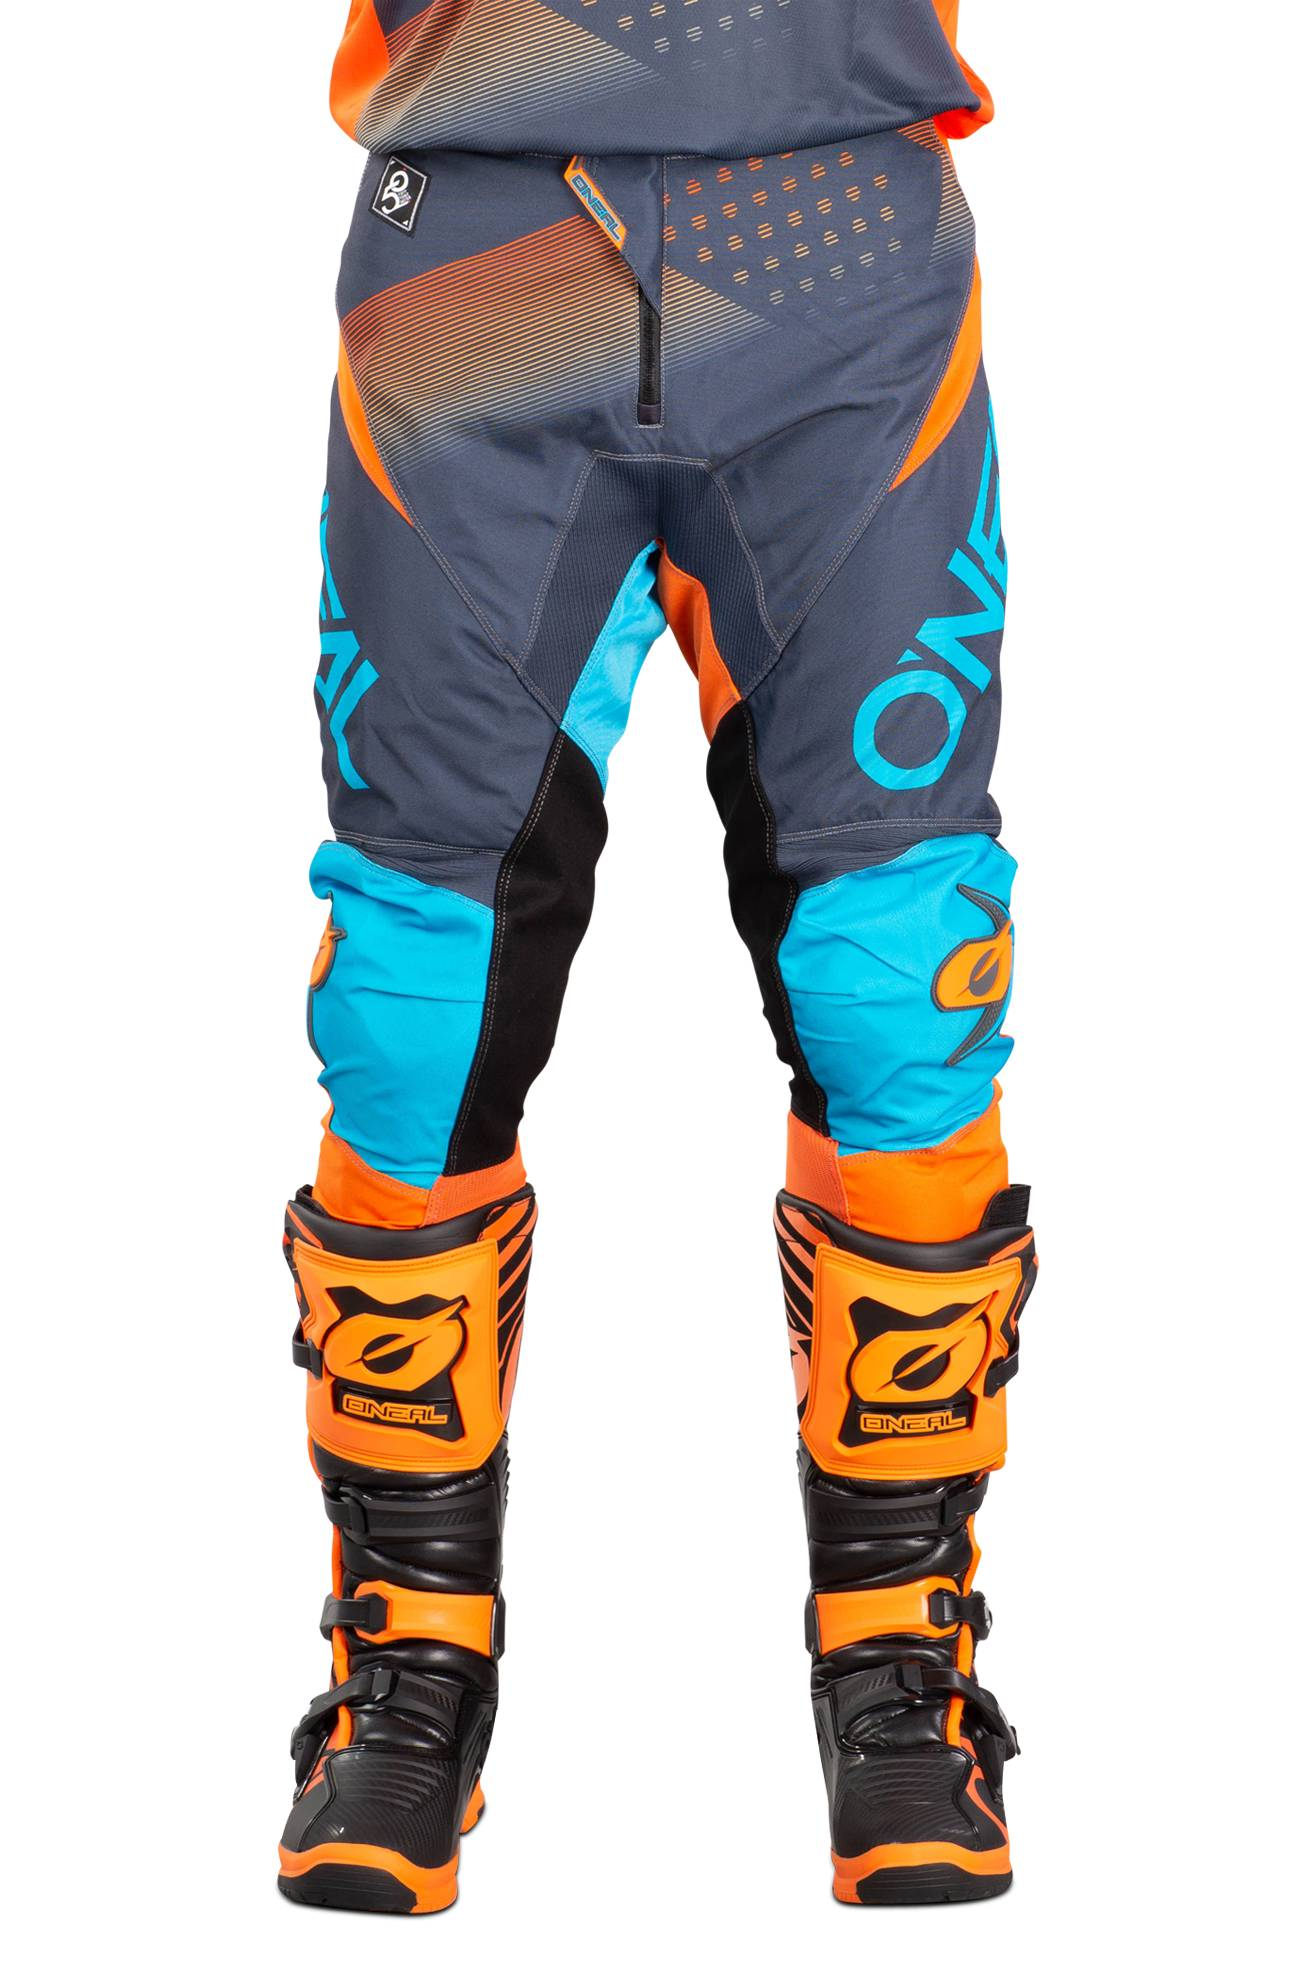 O'Neal Pantalon Cross O'Neal Element Factor Gris-Orange-Bleu